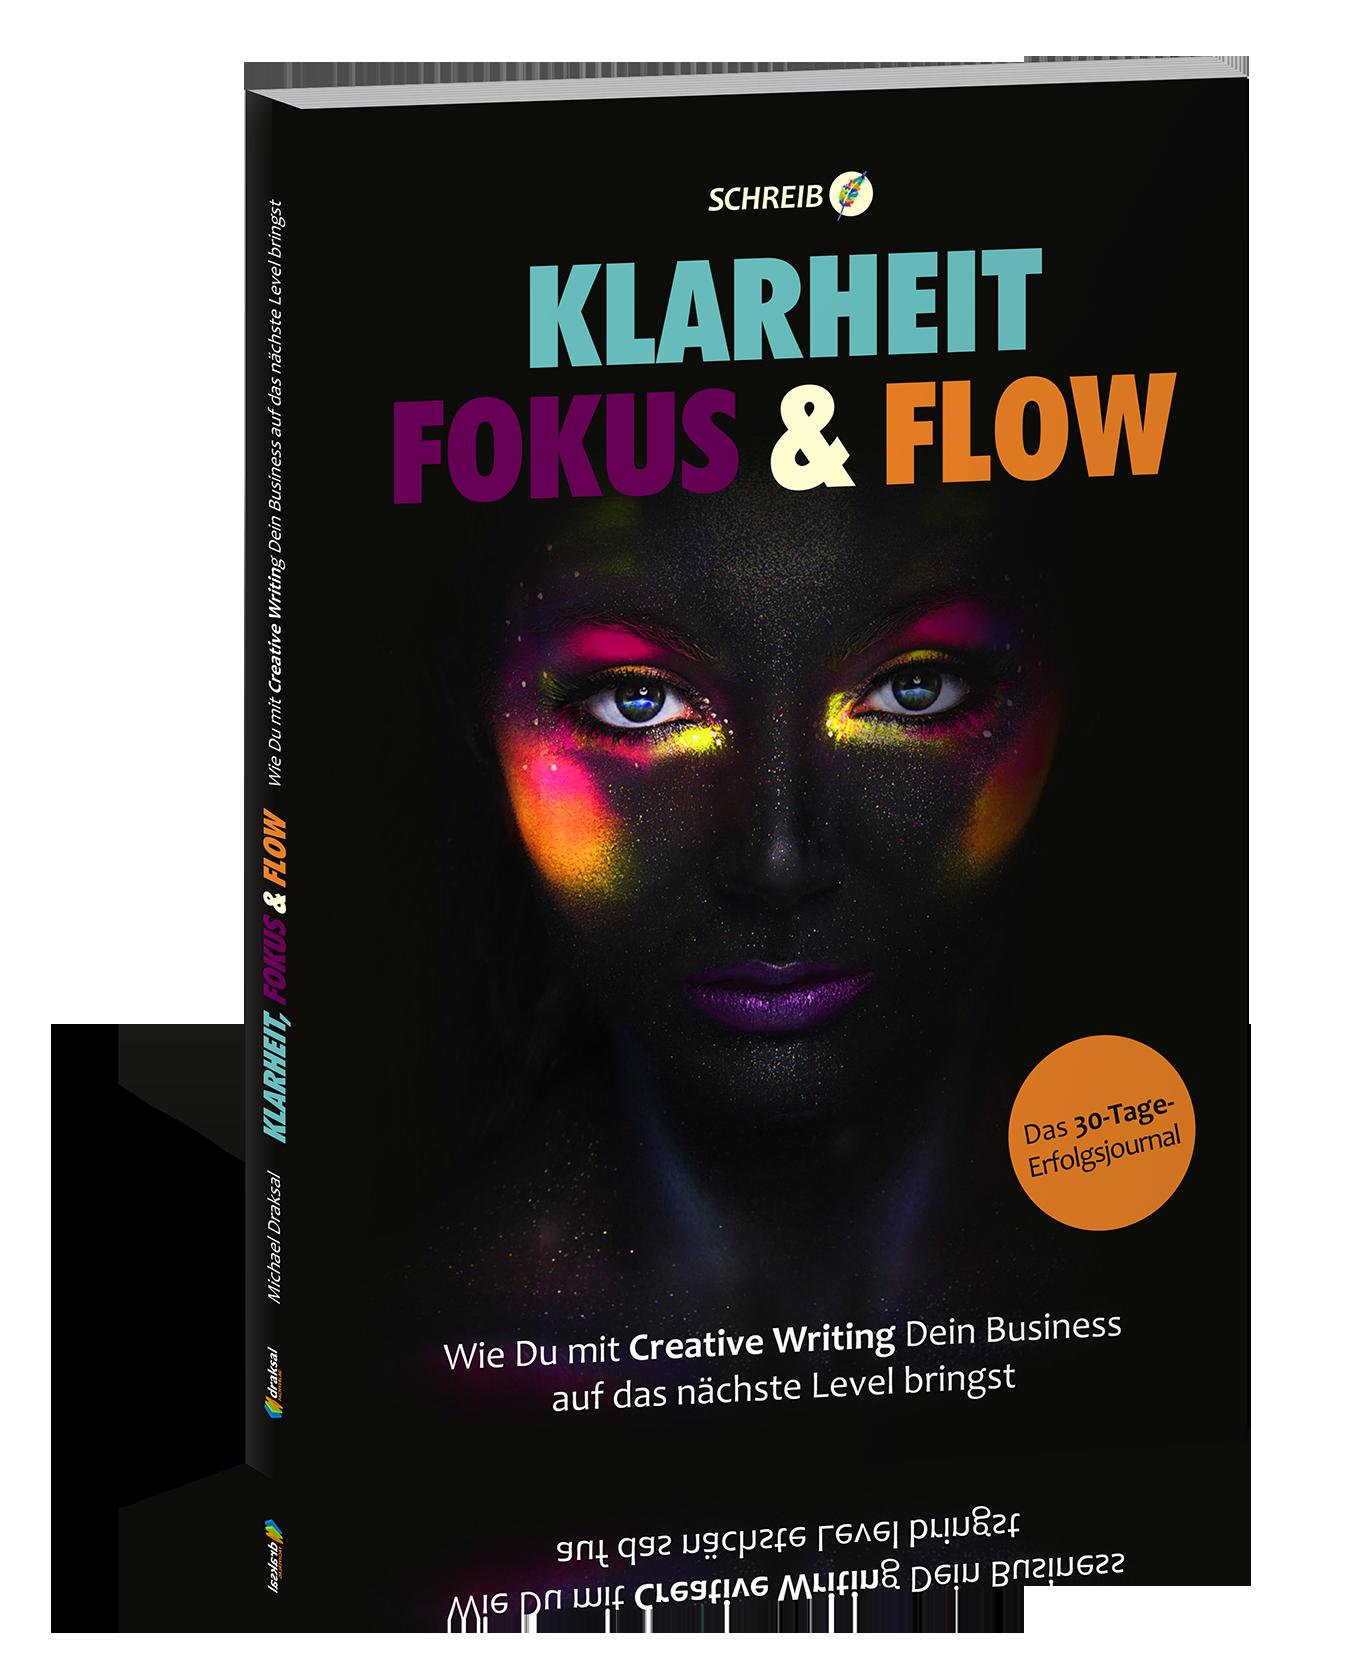 Klarheit - Fokus - Flow